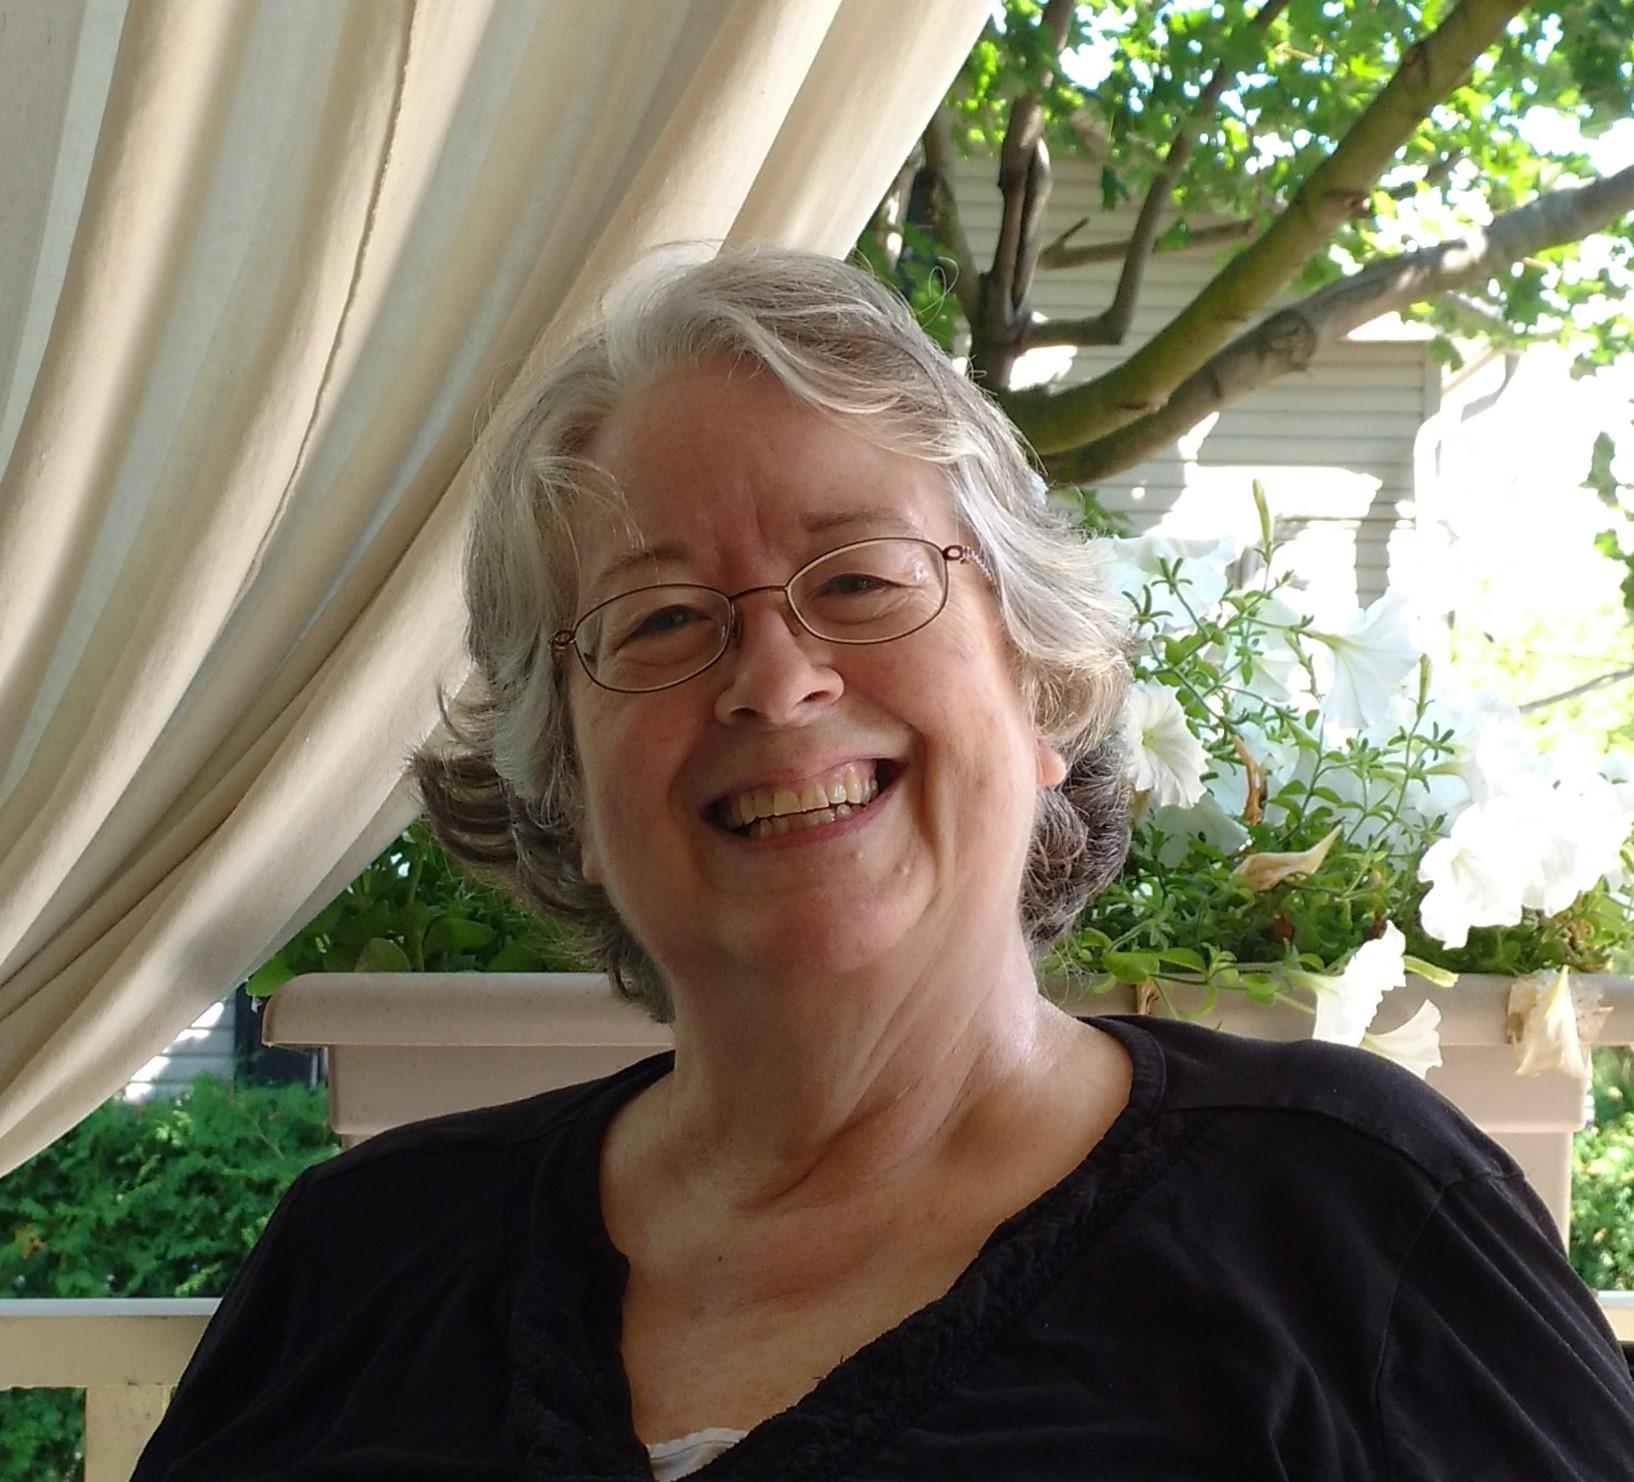 Linda Phillips' profile photo